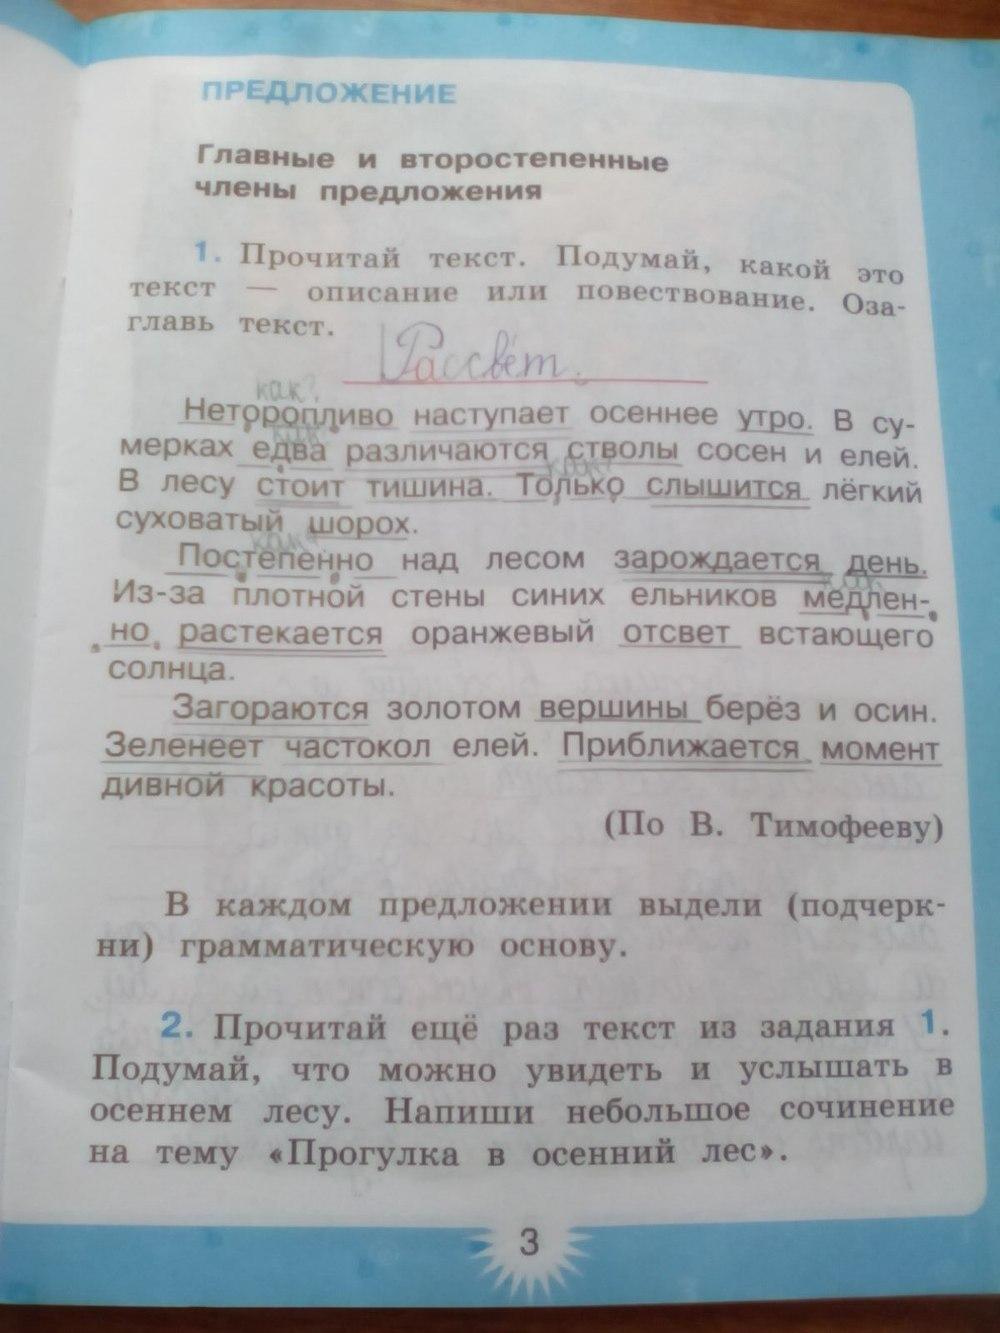 Гдз по русскому языку рабочая тетрадь 3 класс 1 часть зеленина хохлова стр.44 з